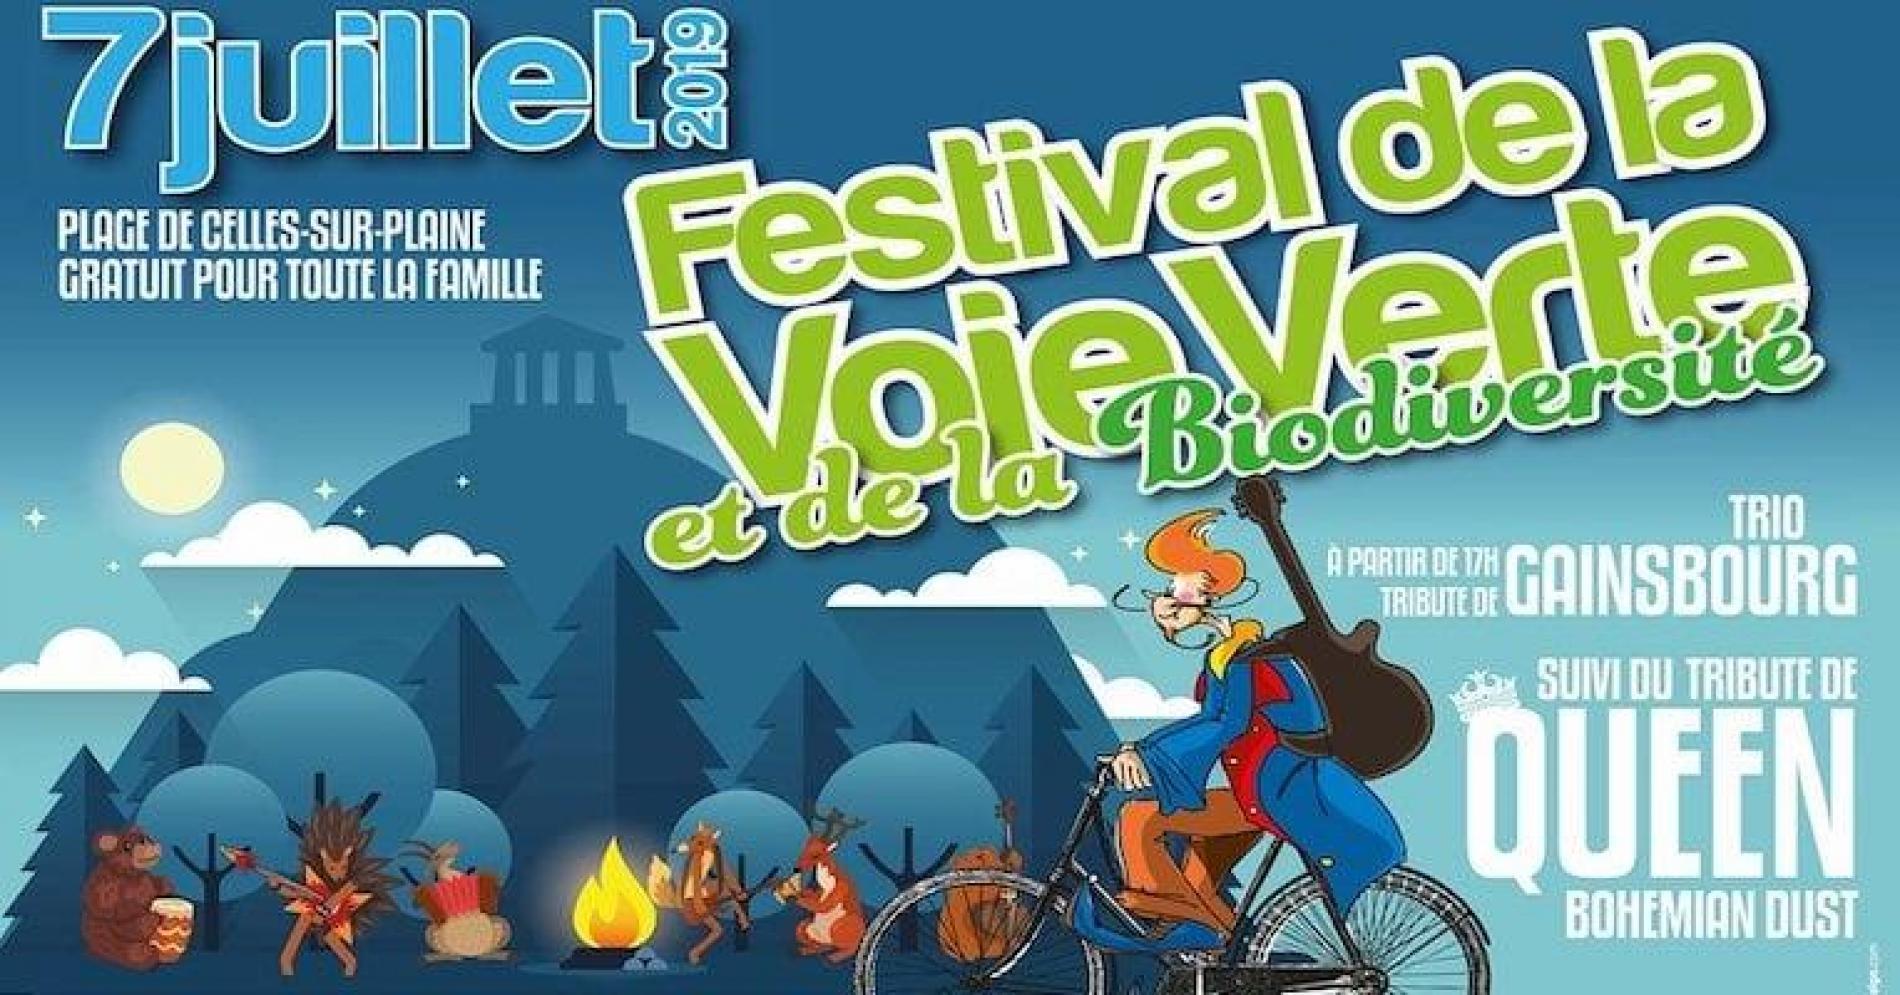 Festival 2019 voie verte